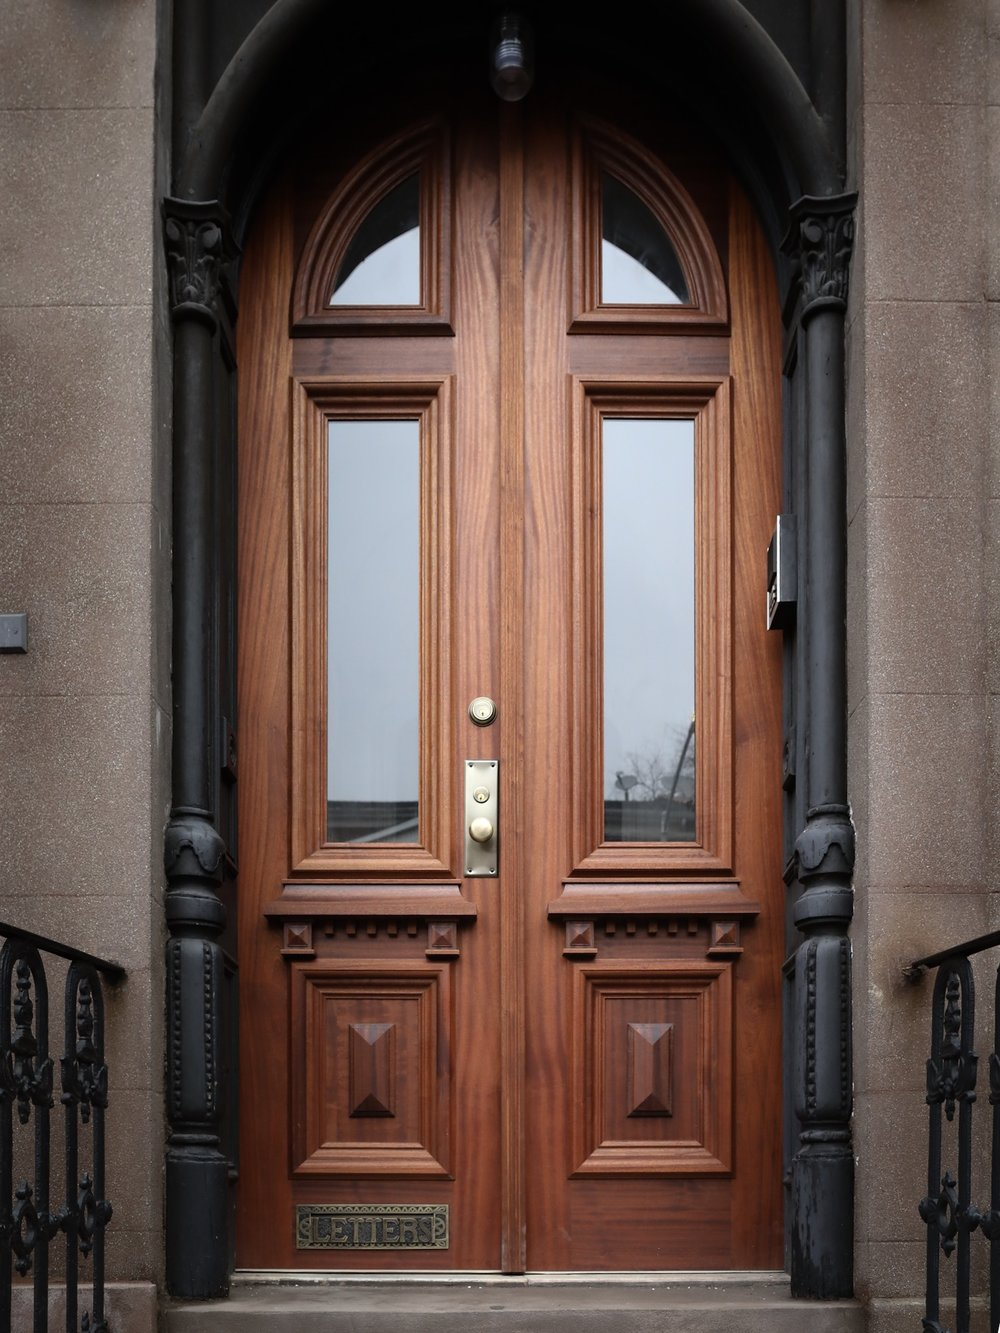 BOERUM HILL ENTRY DOOR, BROOKLYN NYC